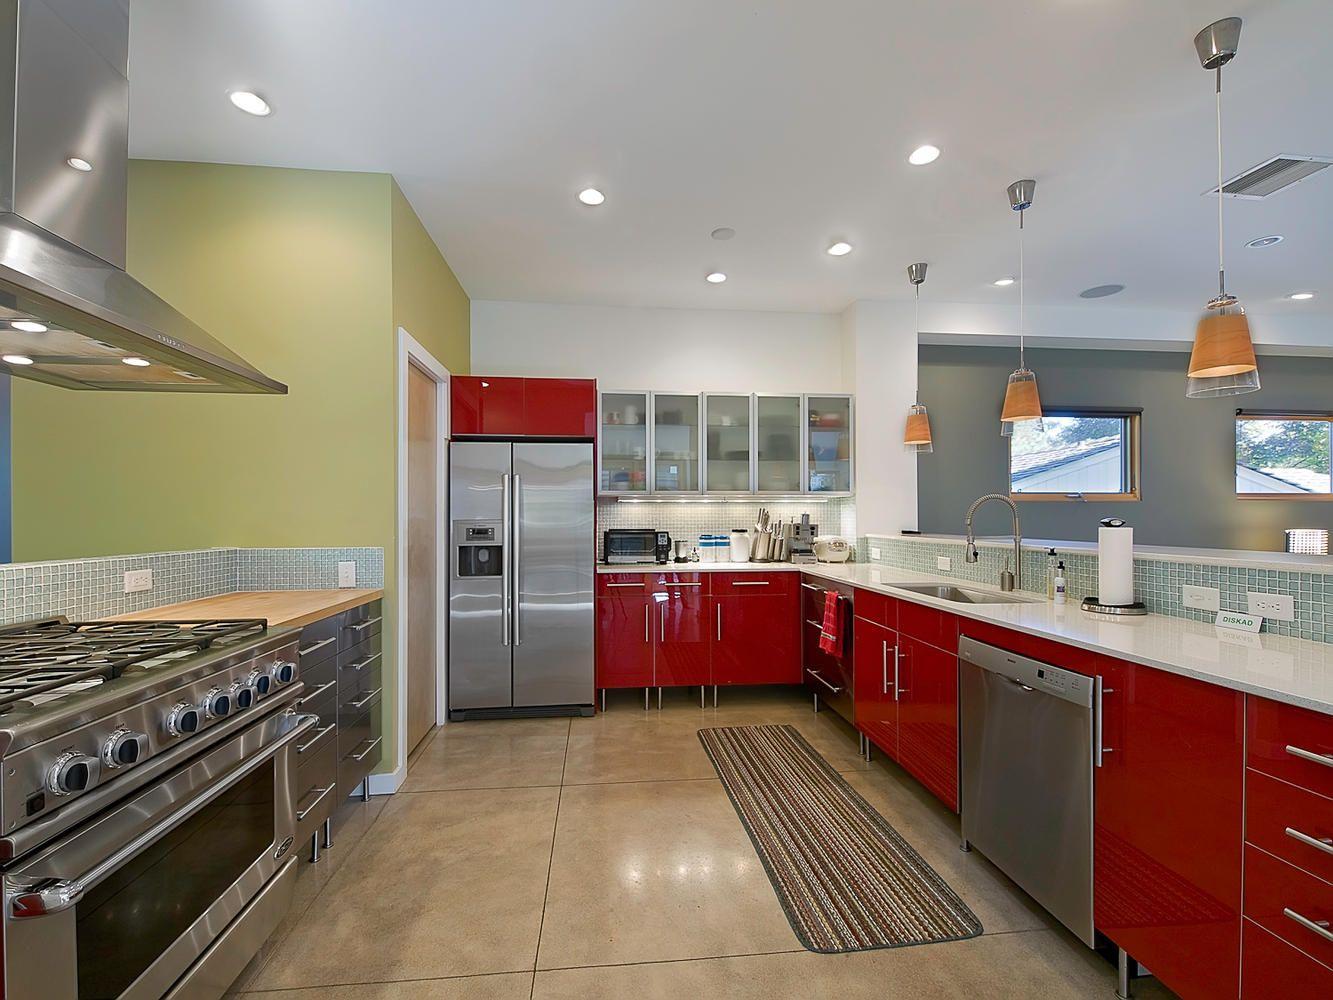 Modern Kitchen Decorating Ideas 17 best images about kitchen decorating ideas on pinterest | oak